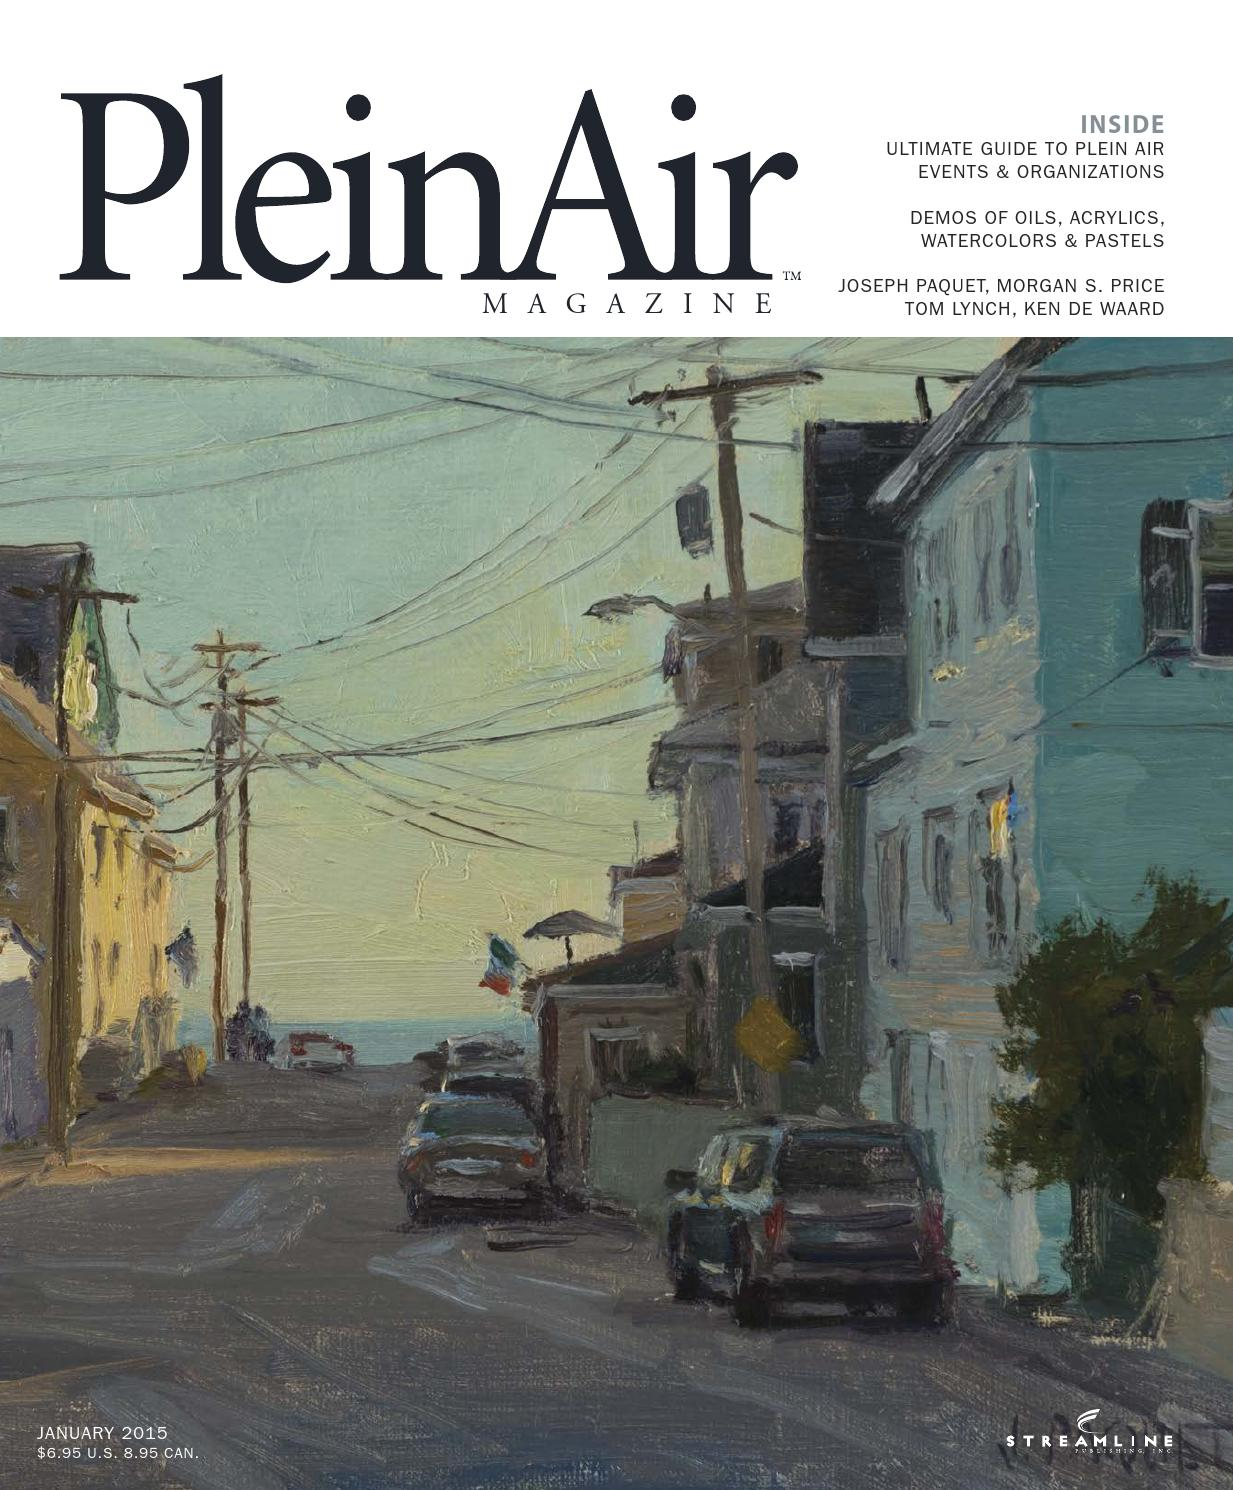 Watercolor artist magazine palm coast fl - Watercolor Artist Magazine Palm Coast Fl 53